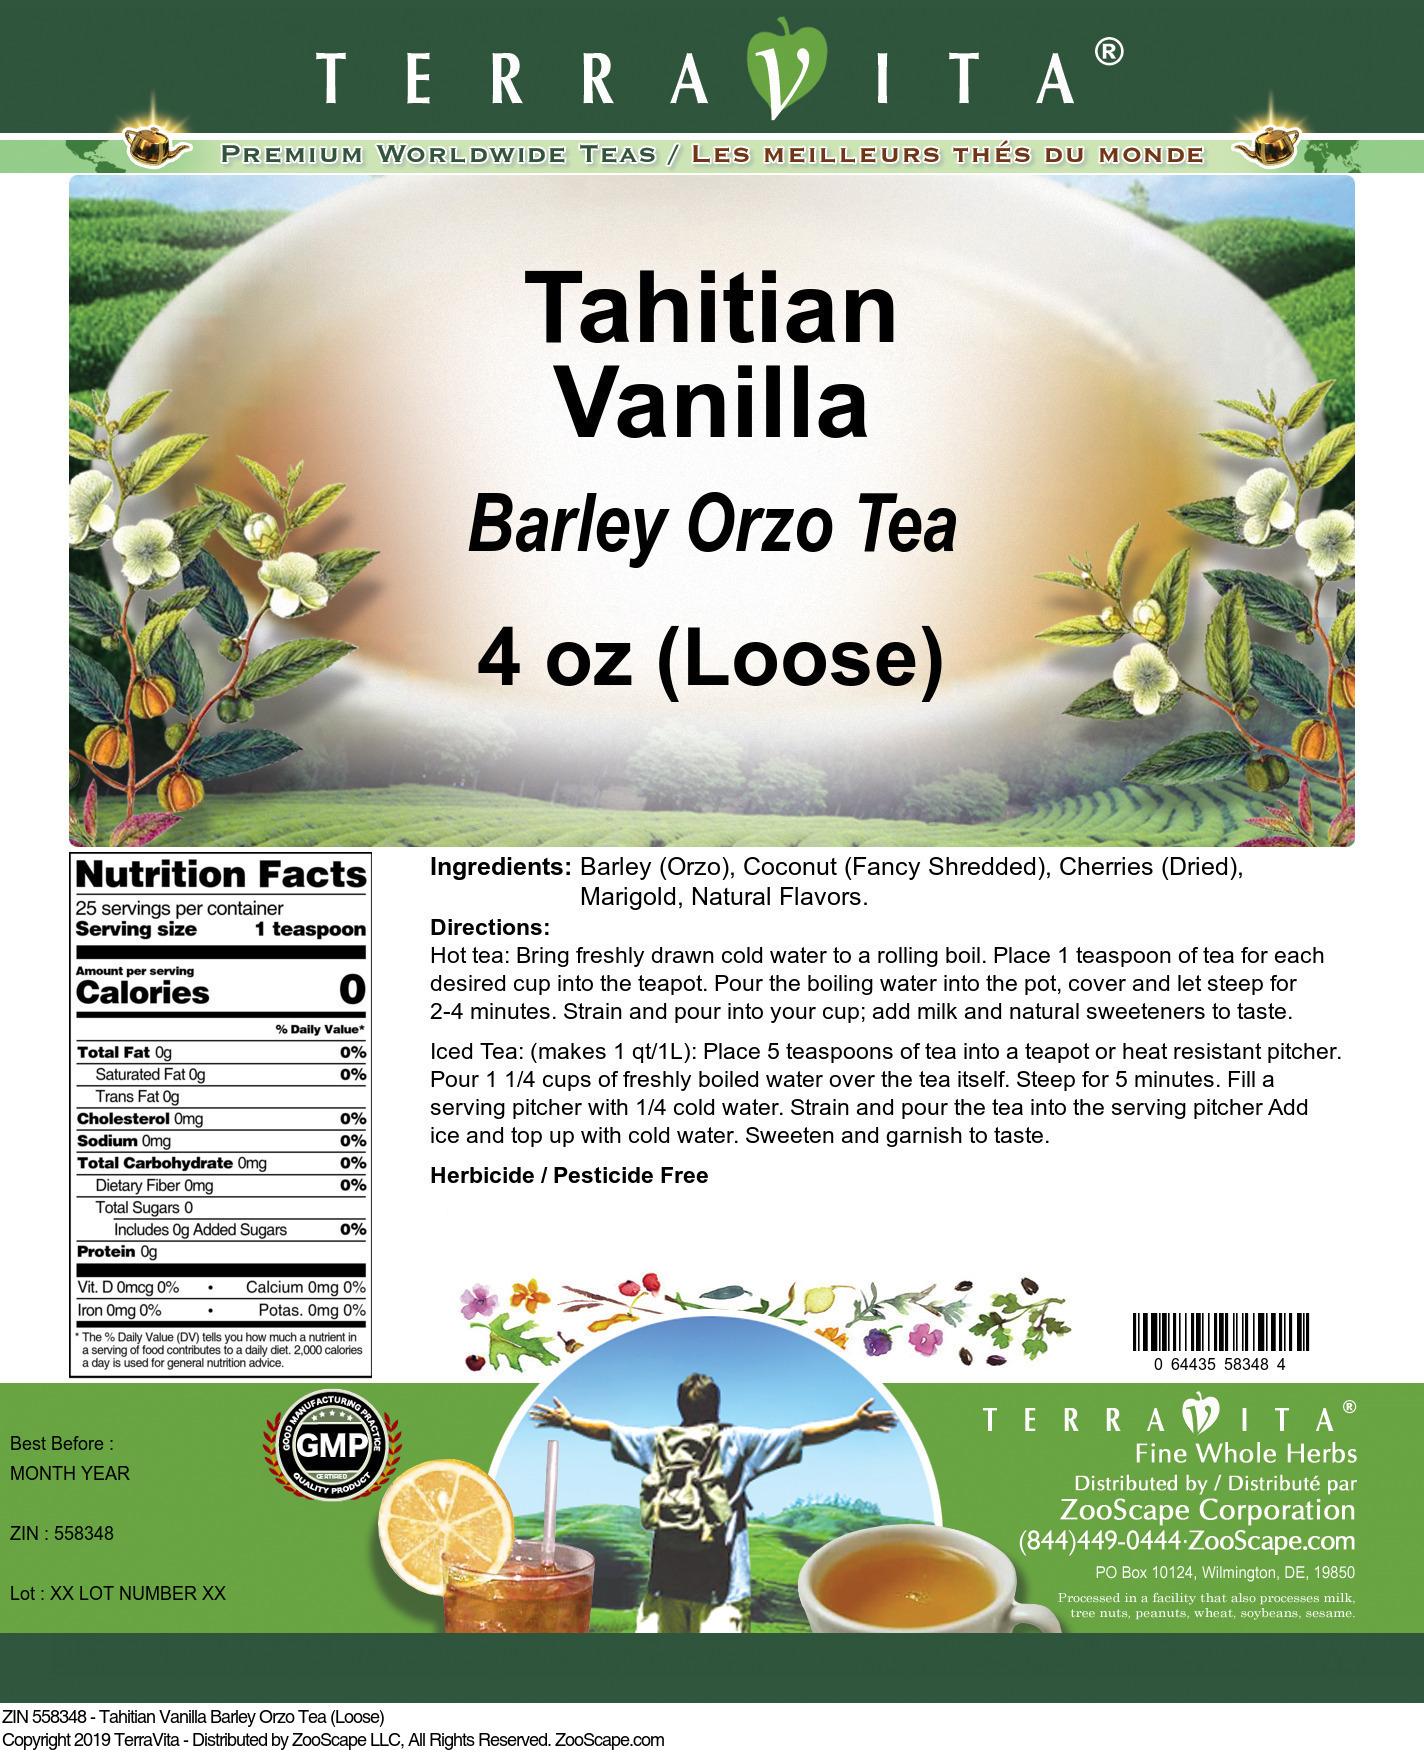 Tahitian Vanilla Barley Orzo